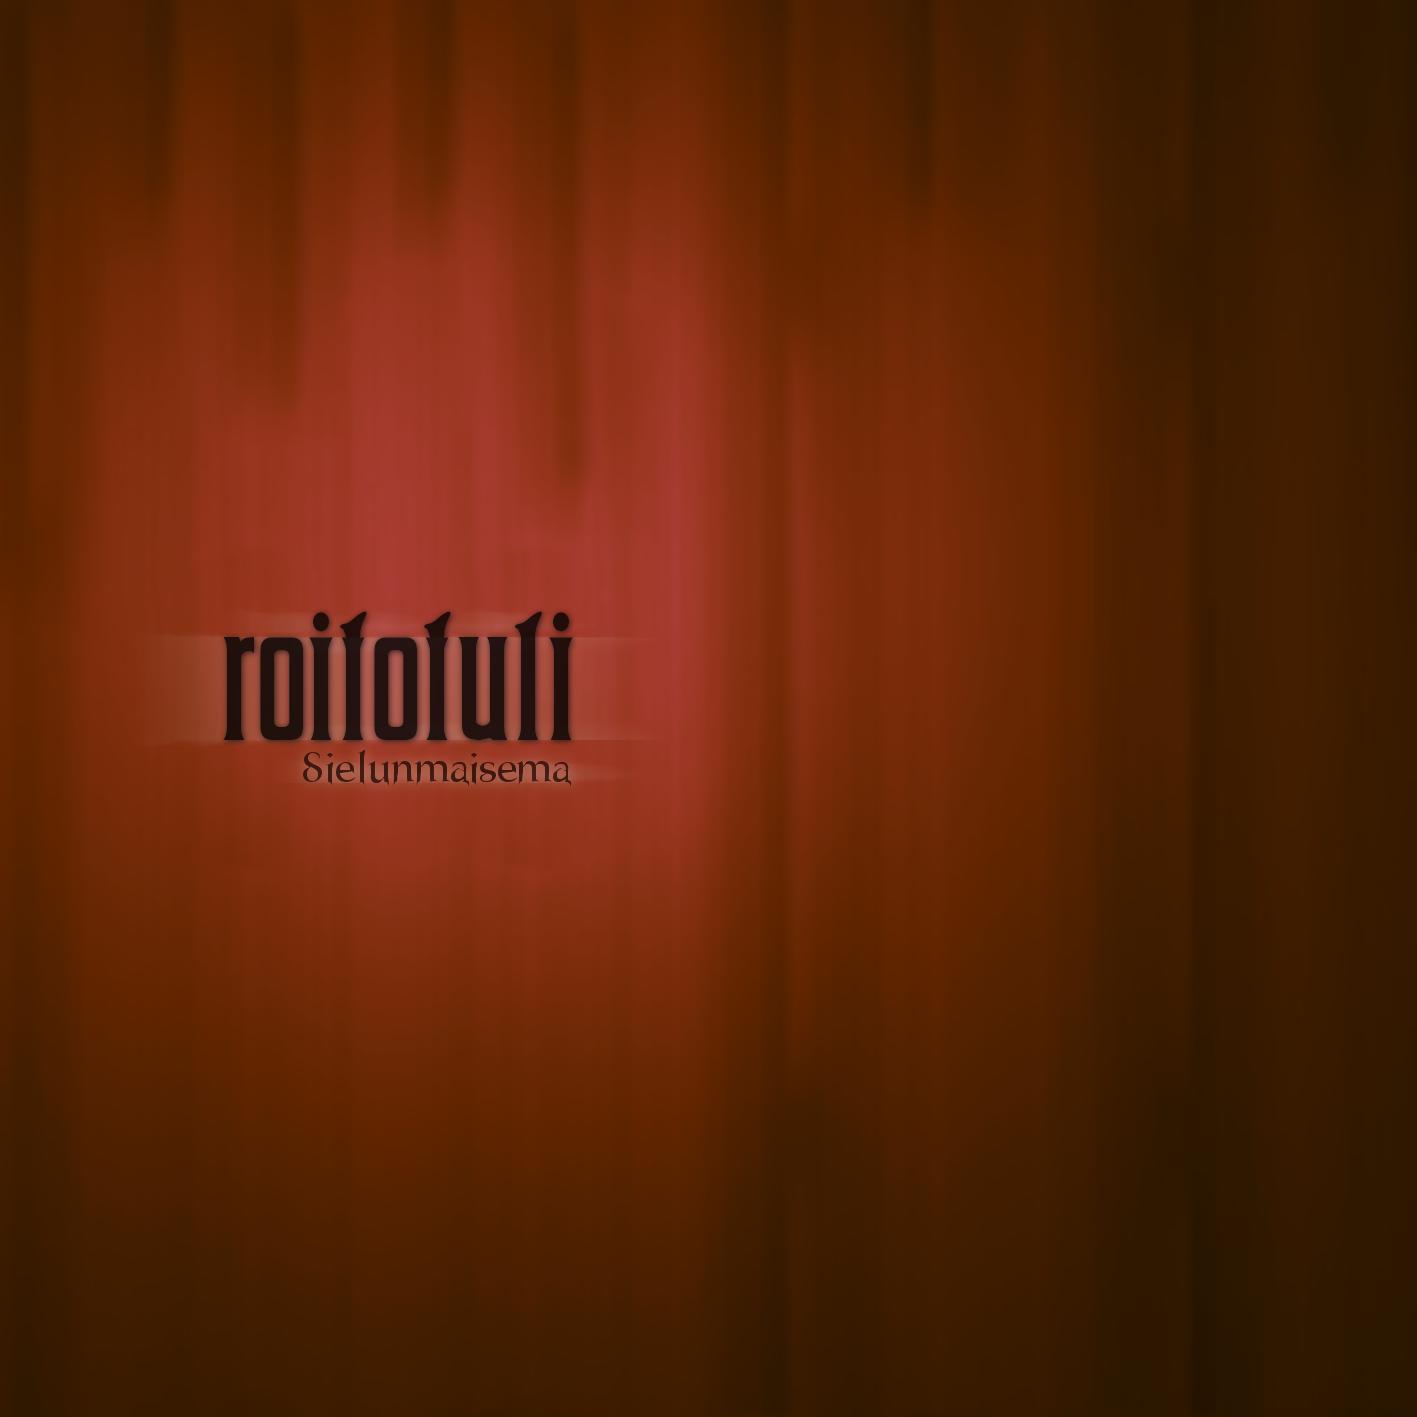 Roitotuli – Sielunmaisema